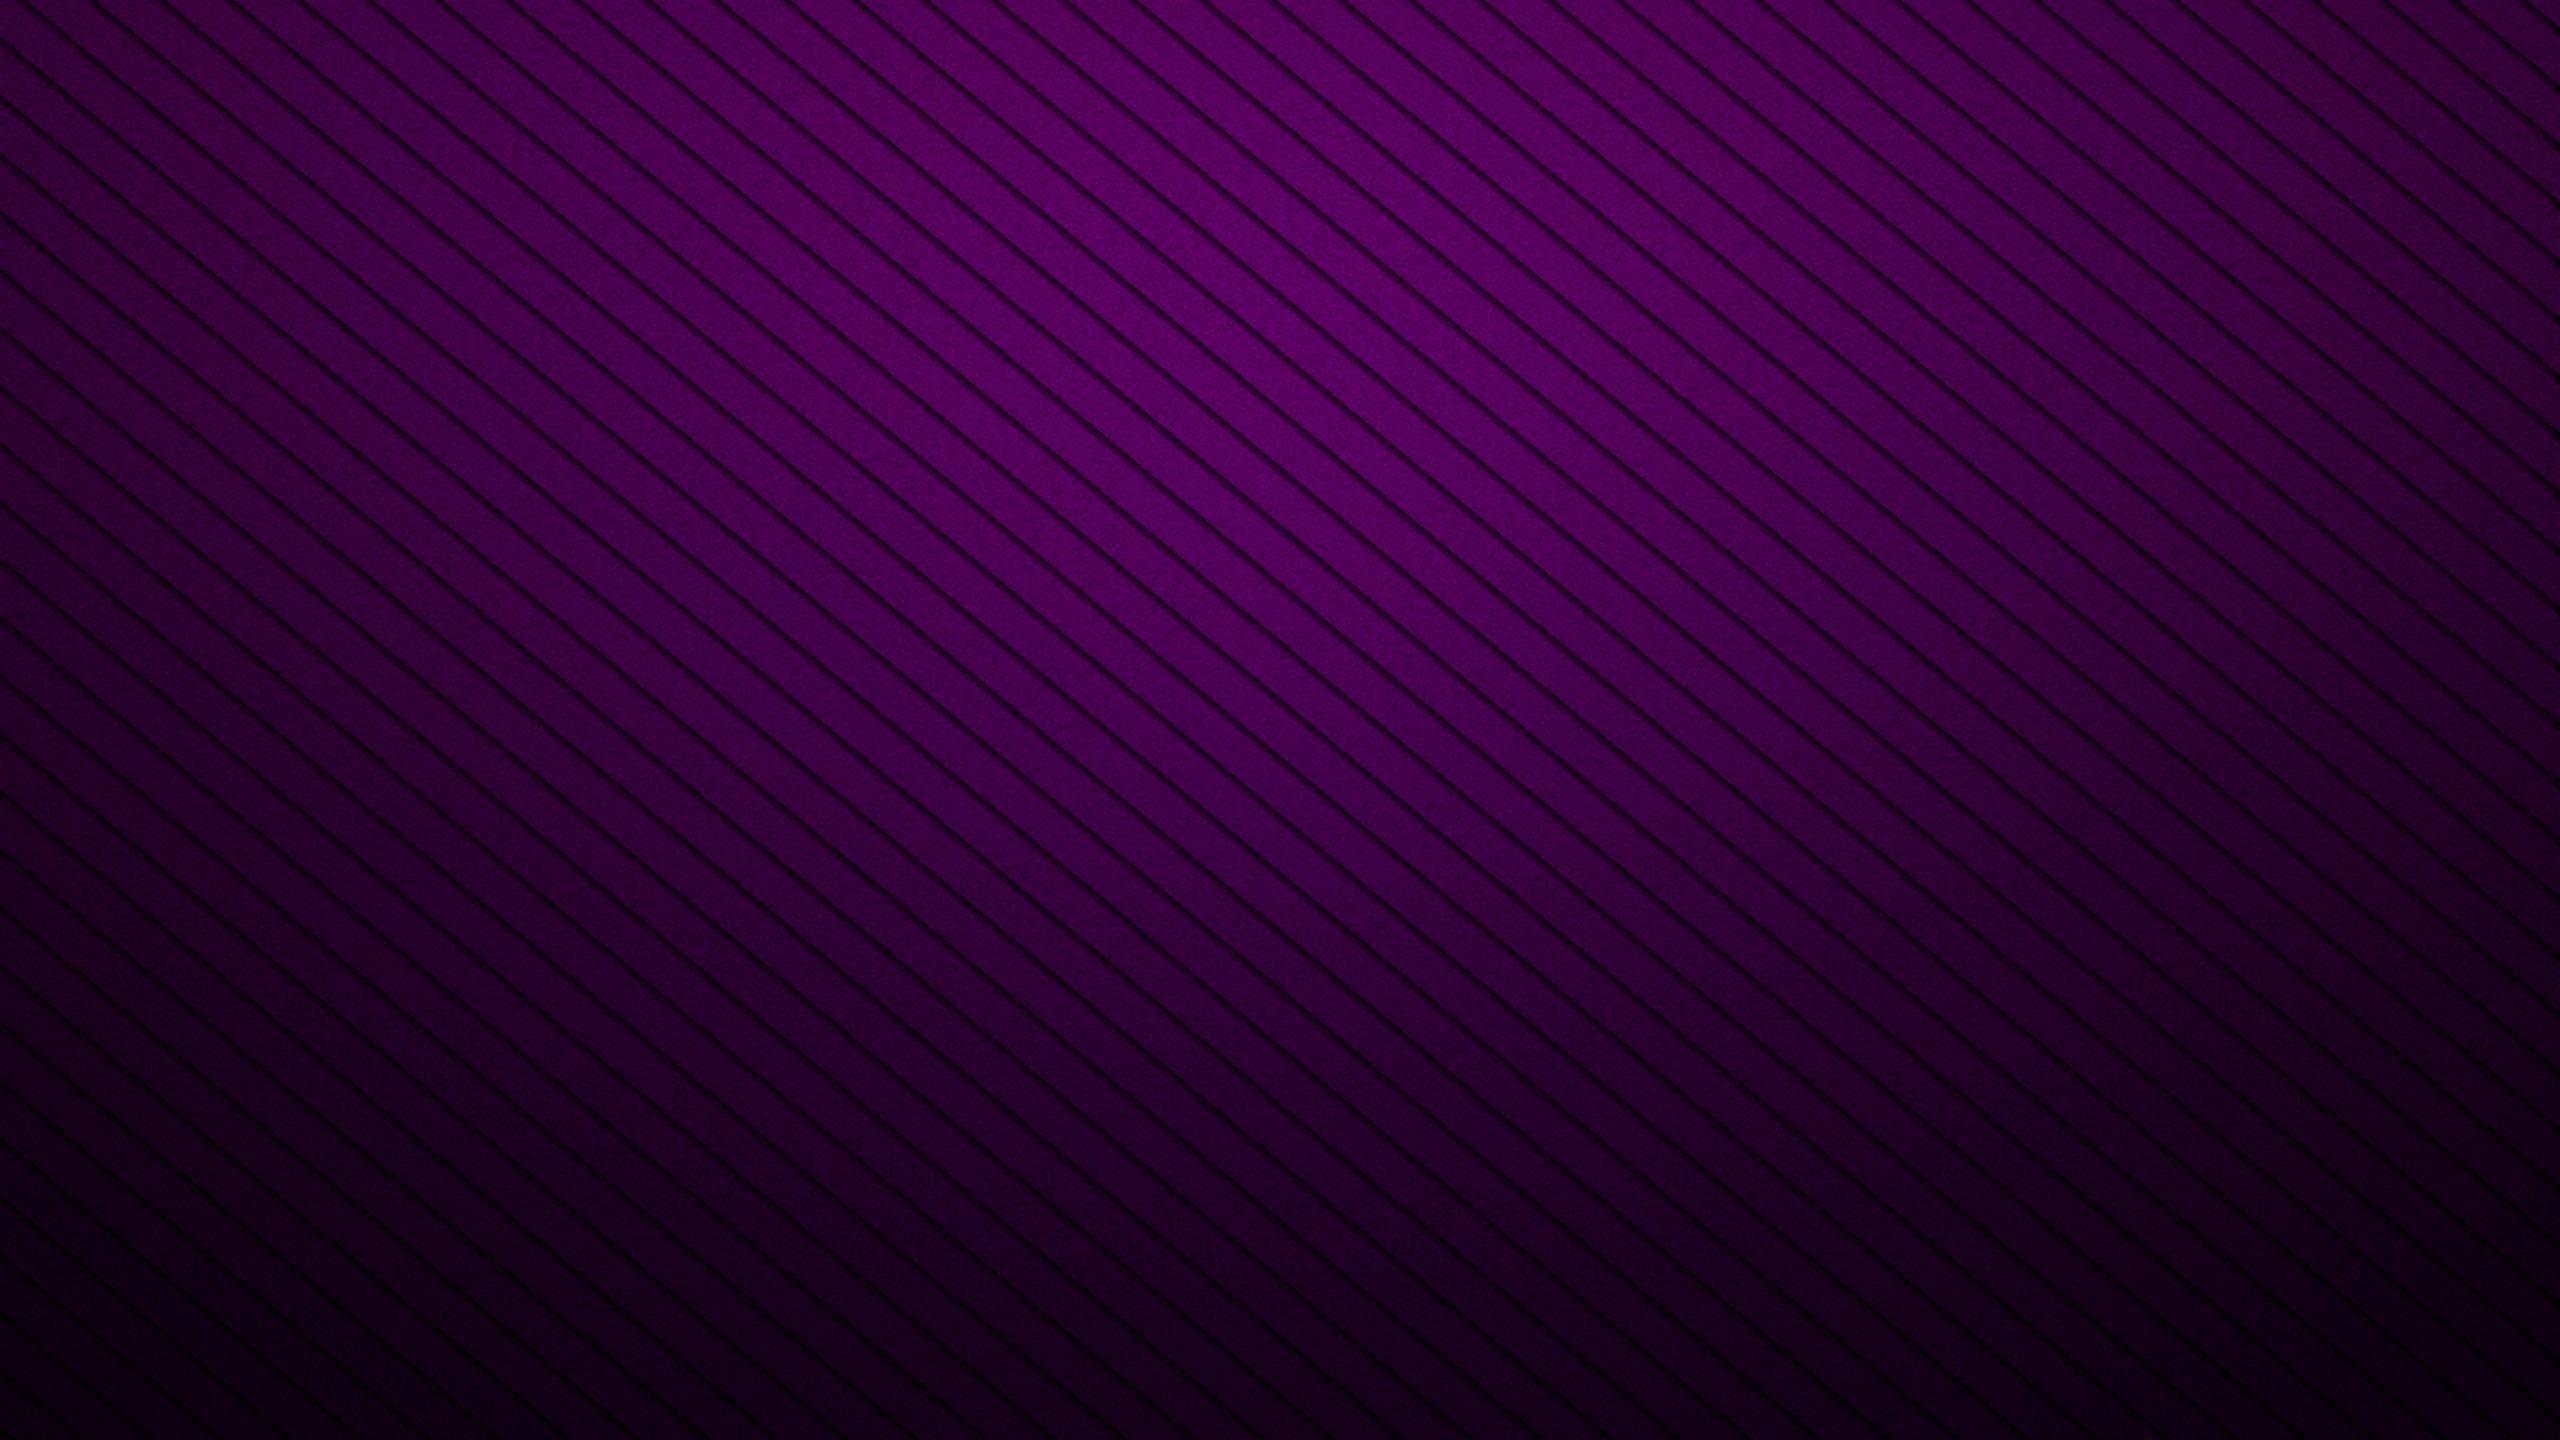 Black Purple Wallpaper Hd 75 Images